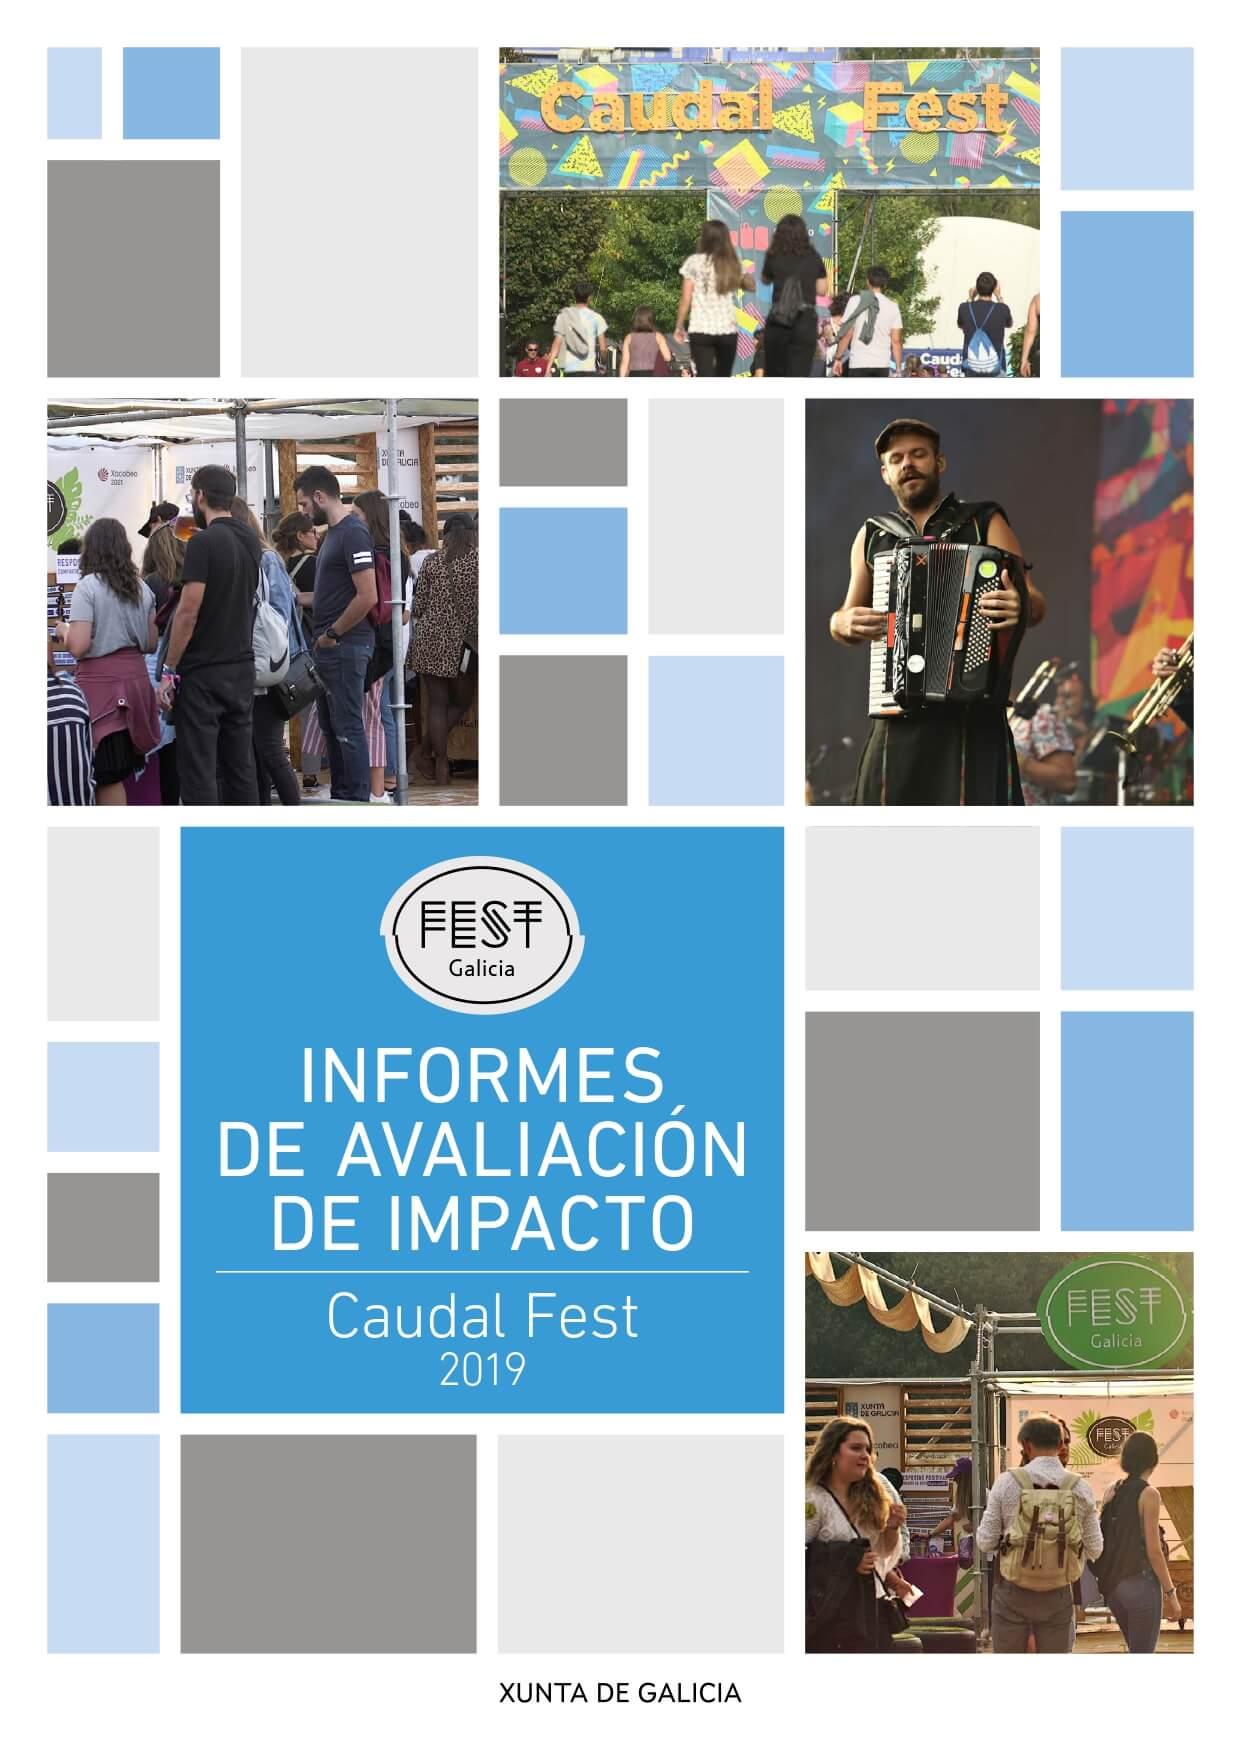 Fest Galicia informe Caudal Fest 2019